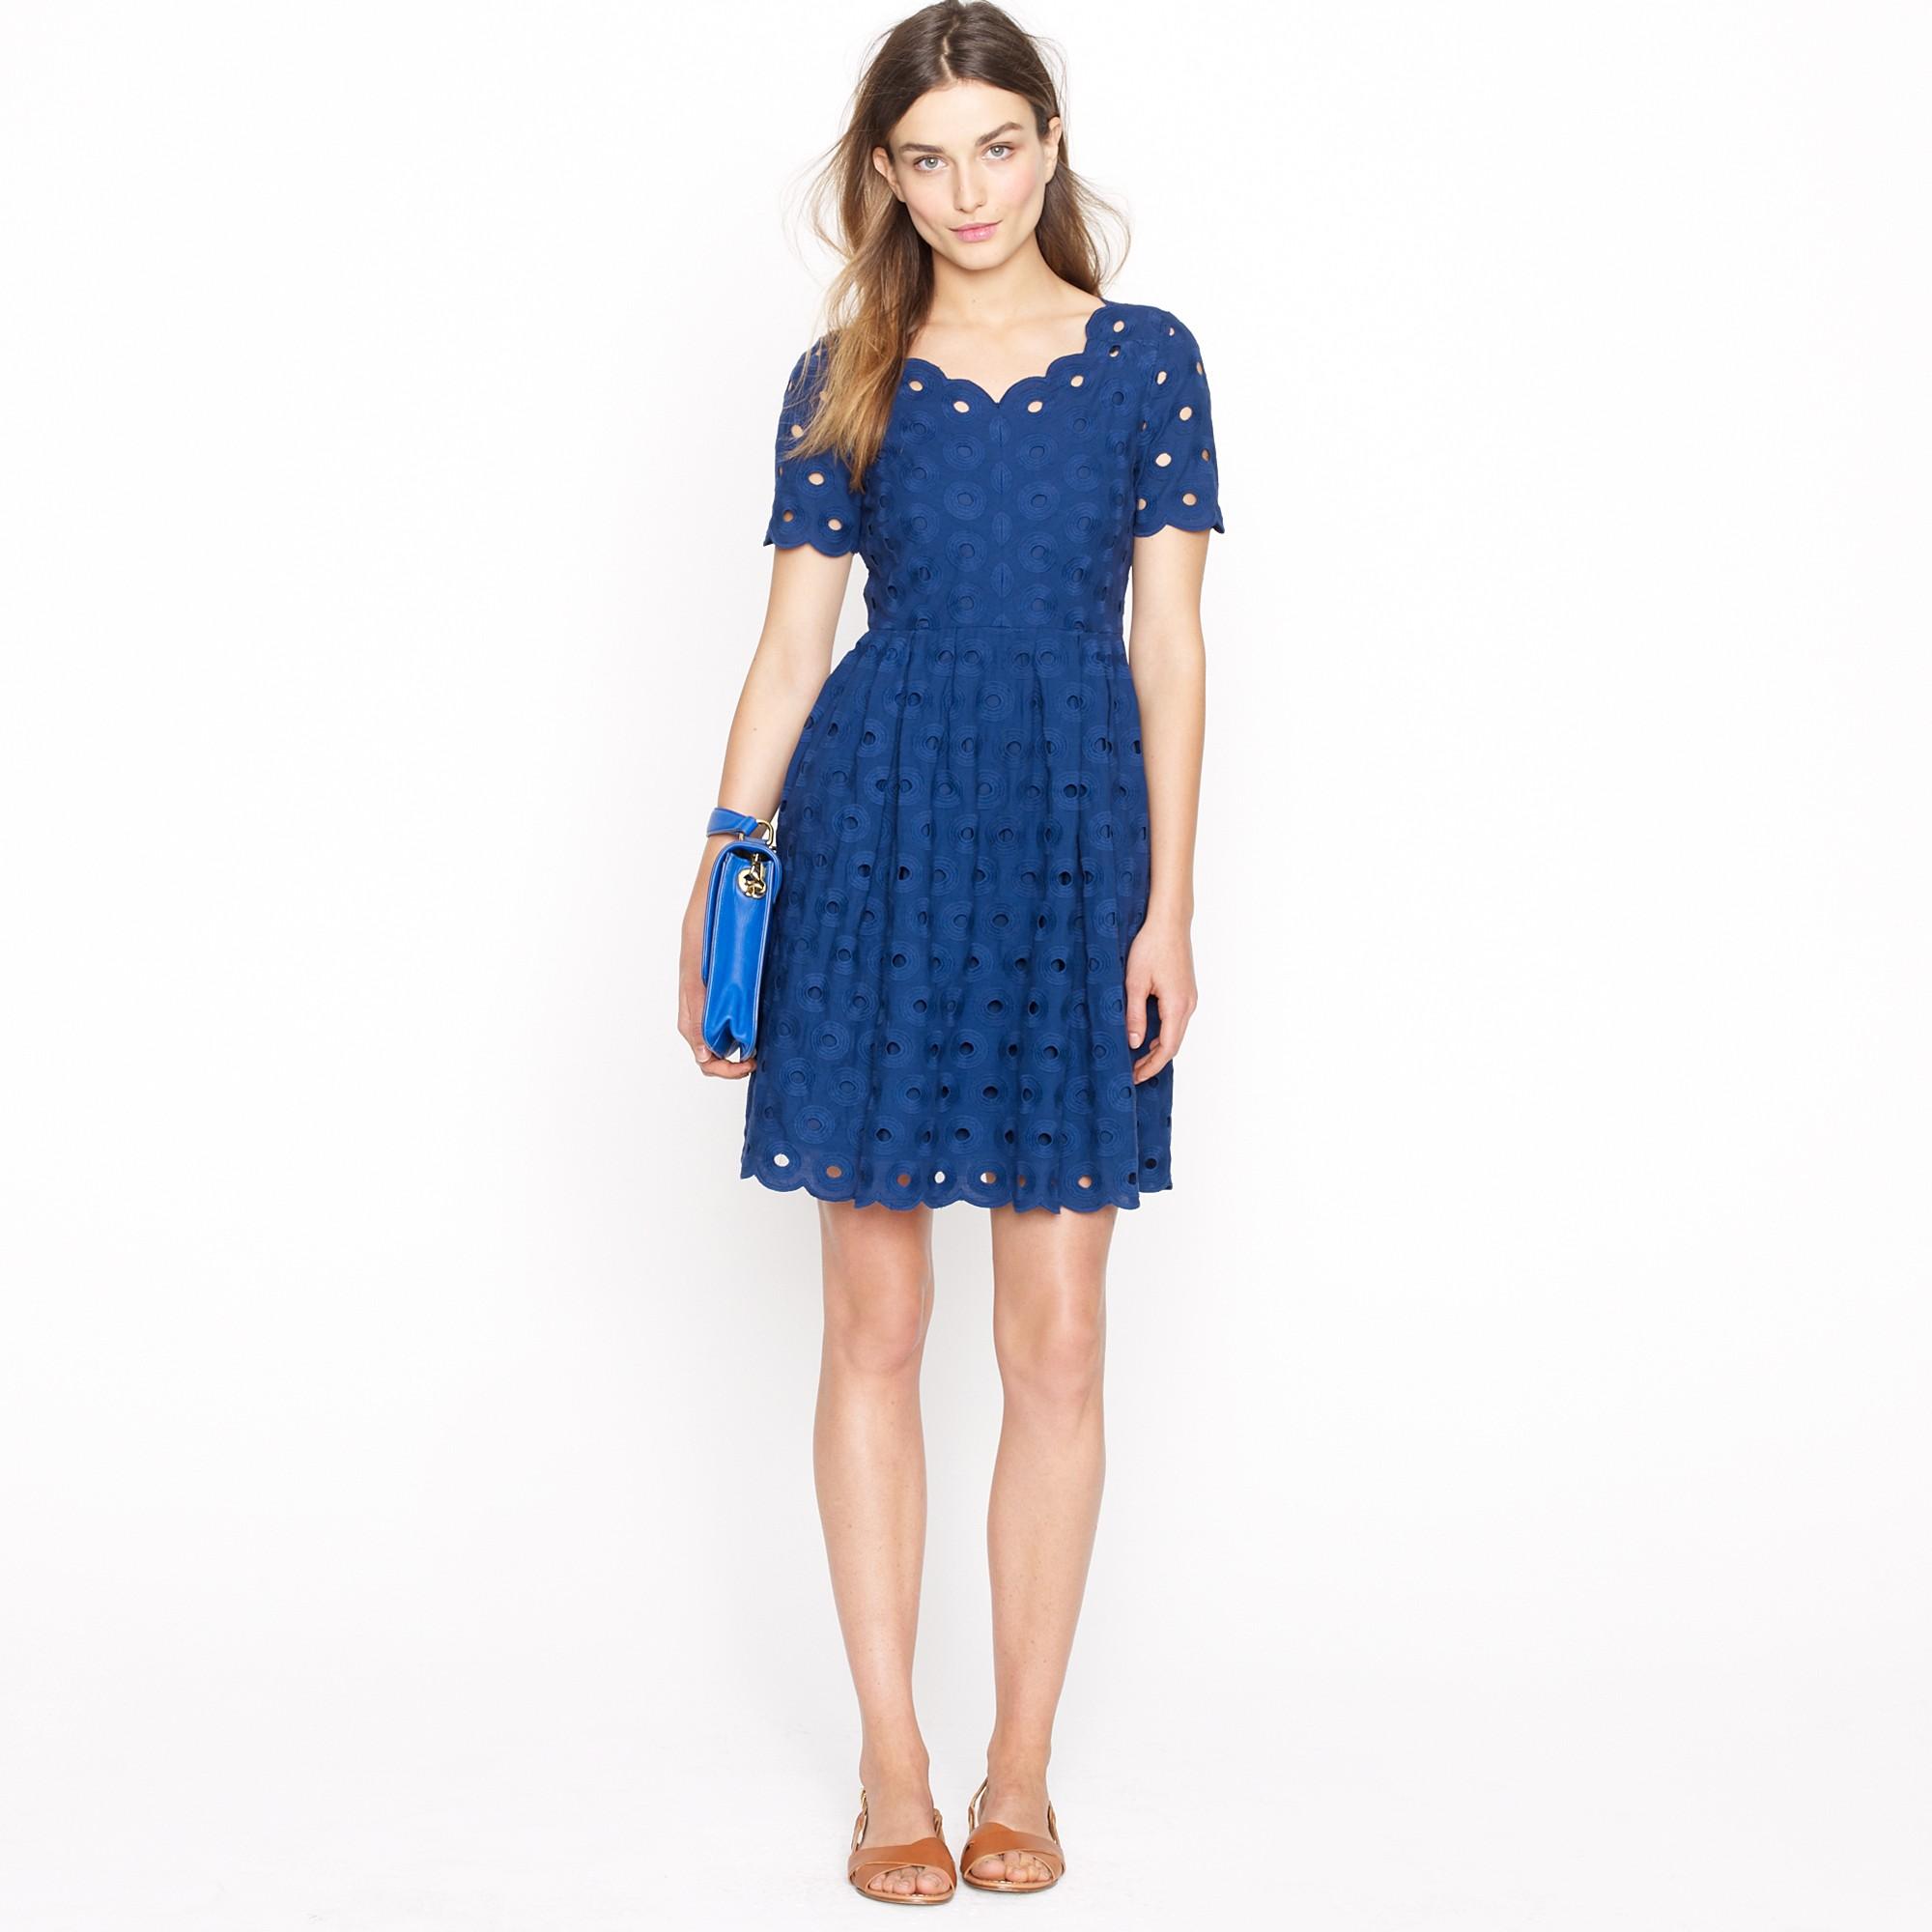 J.crew Circle Eyelet Dress in Blue  Lyst